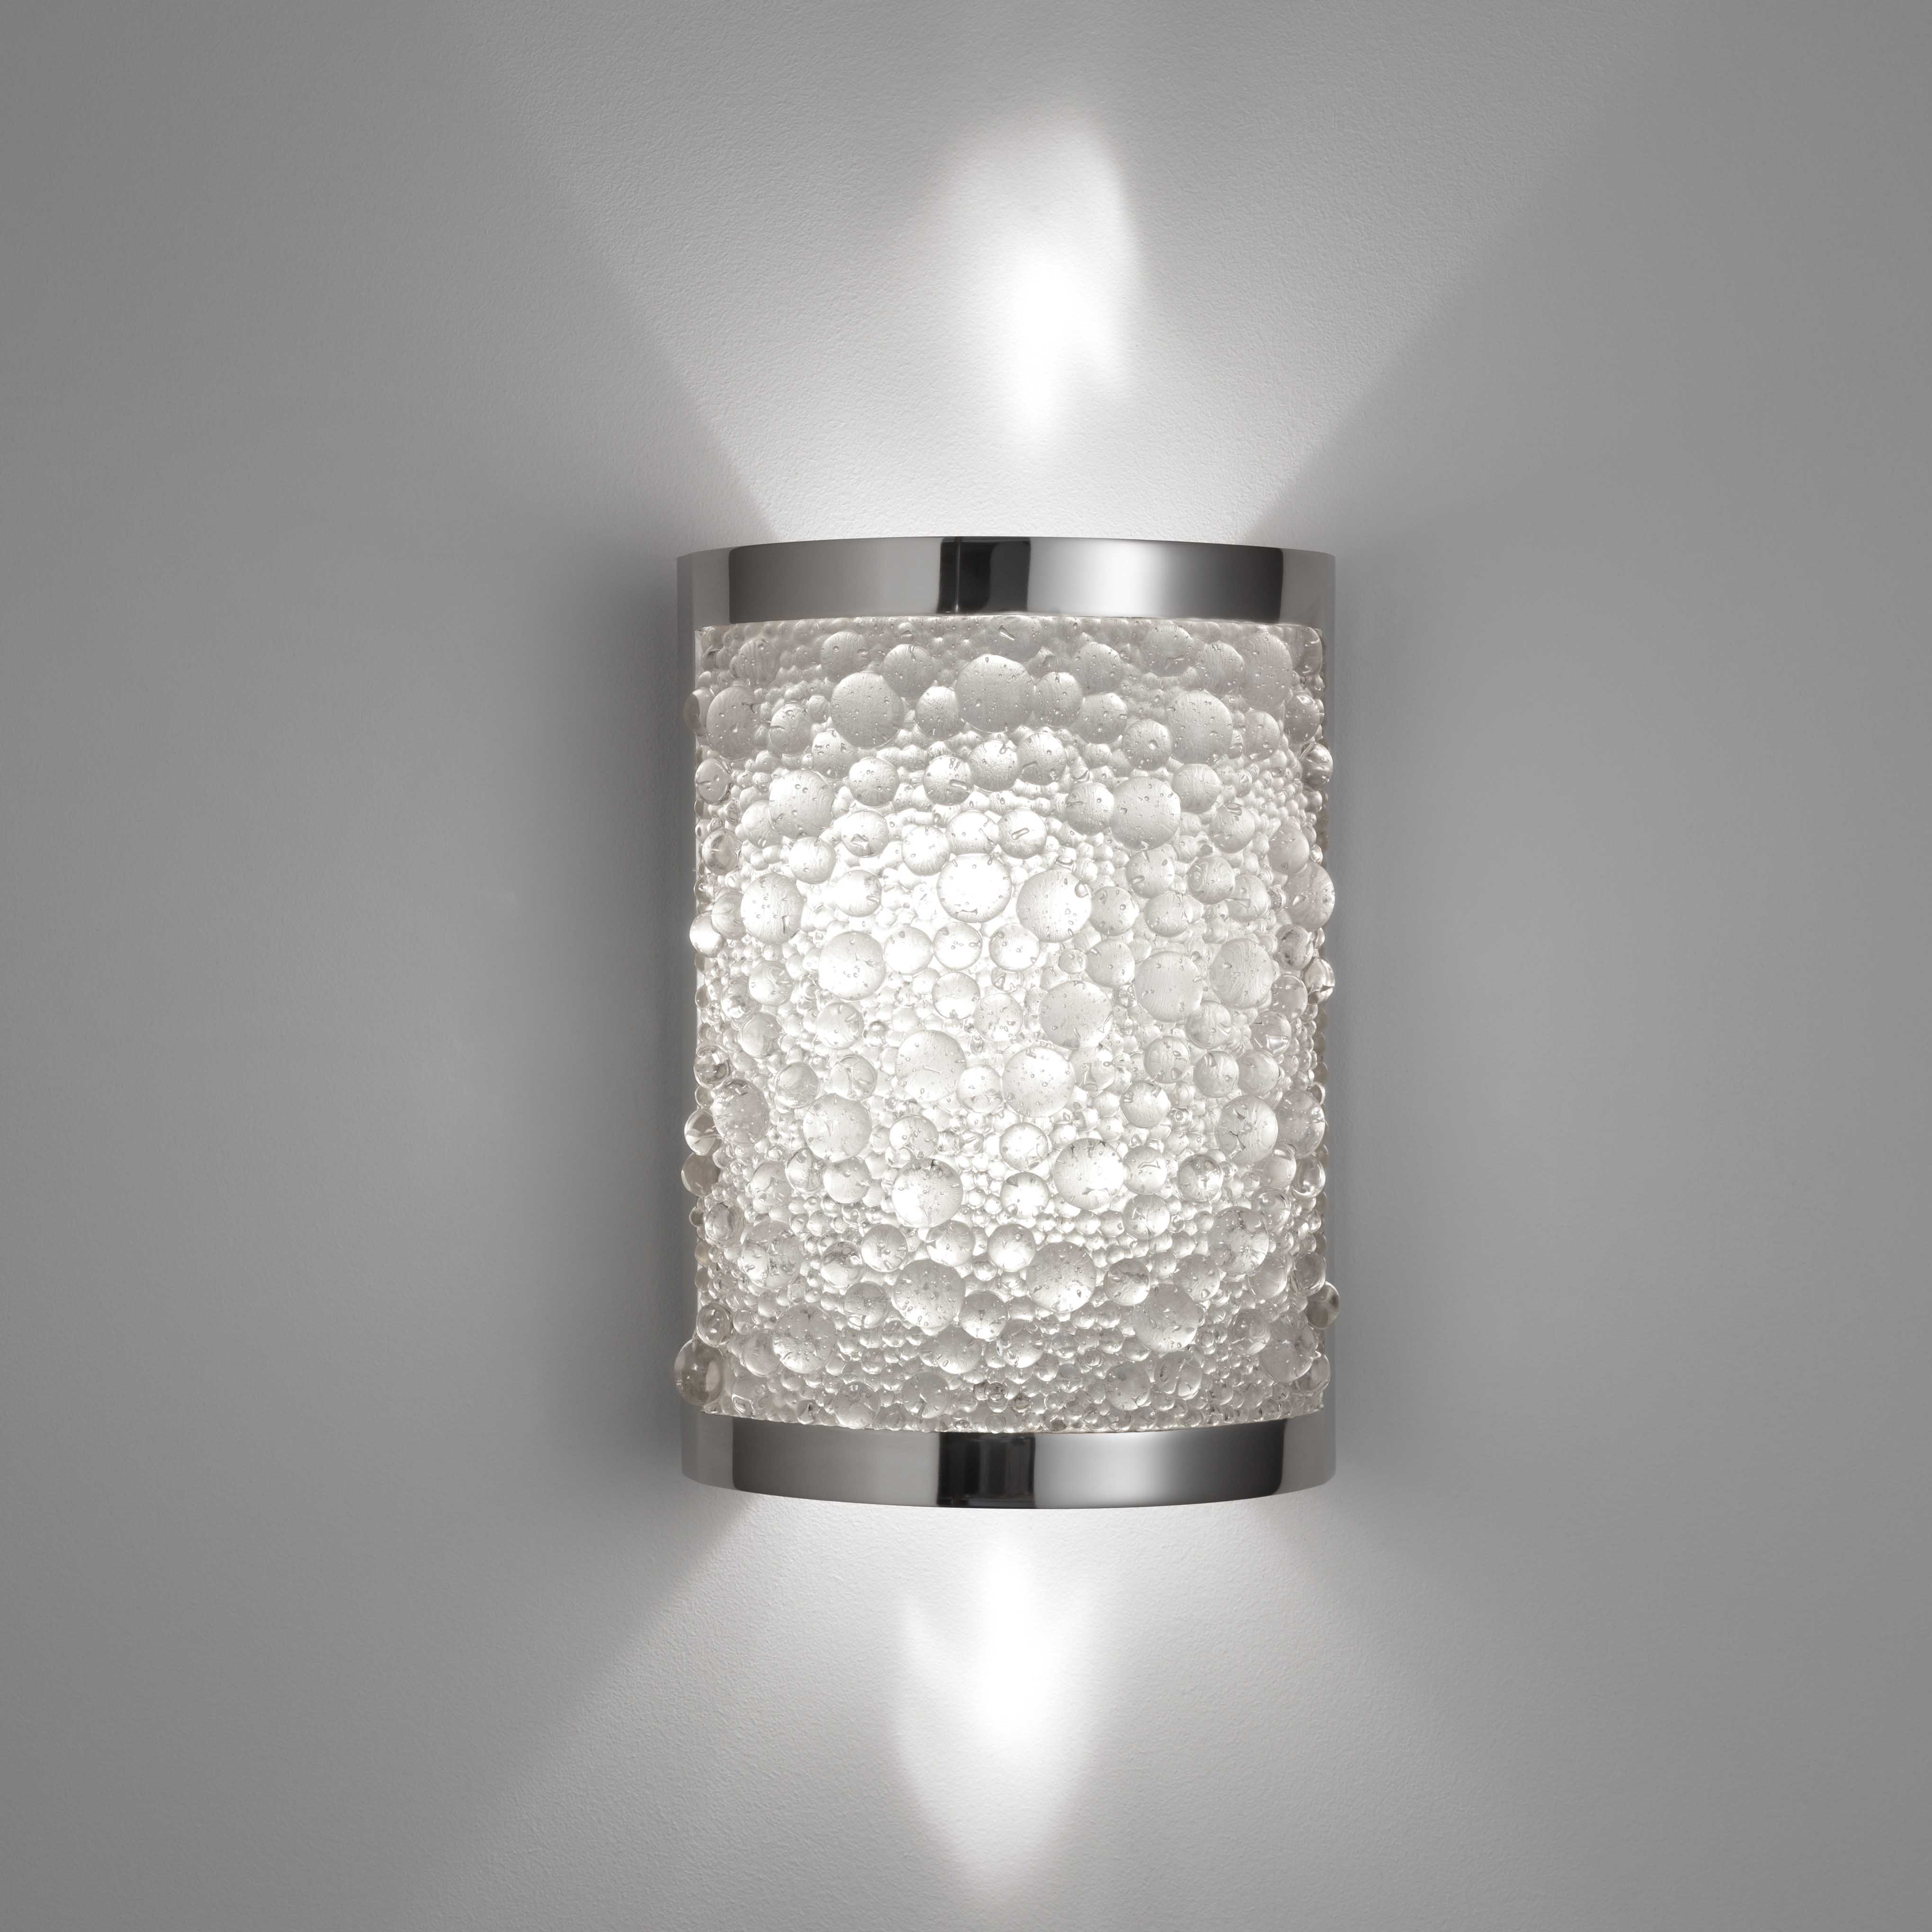 Marvelous Art Deco Bathroom Wall Lights Uk Pics Designs Dievoon